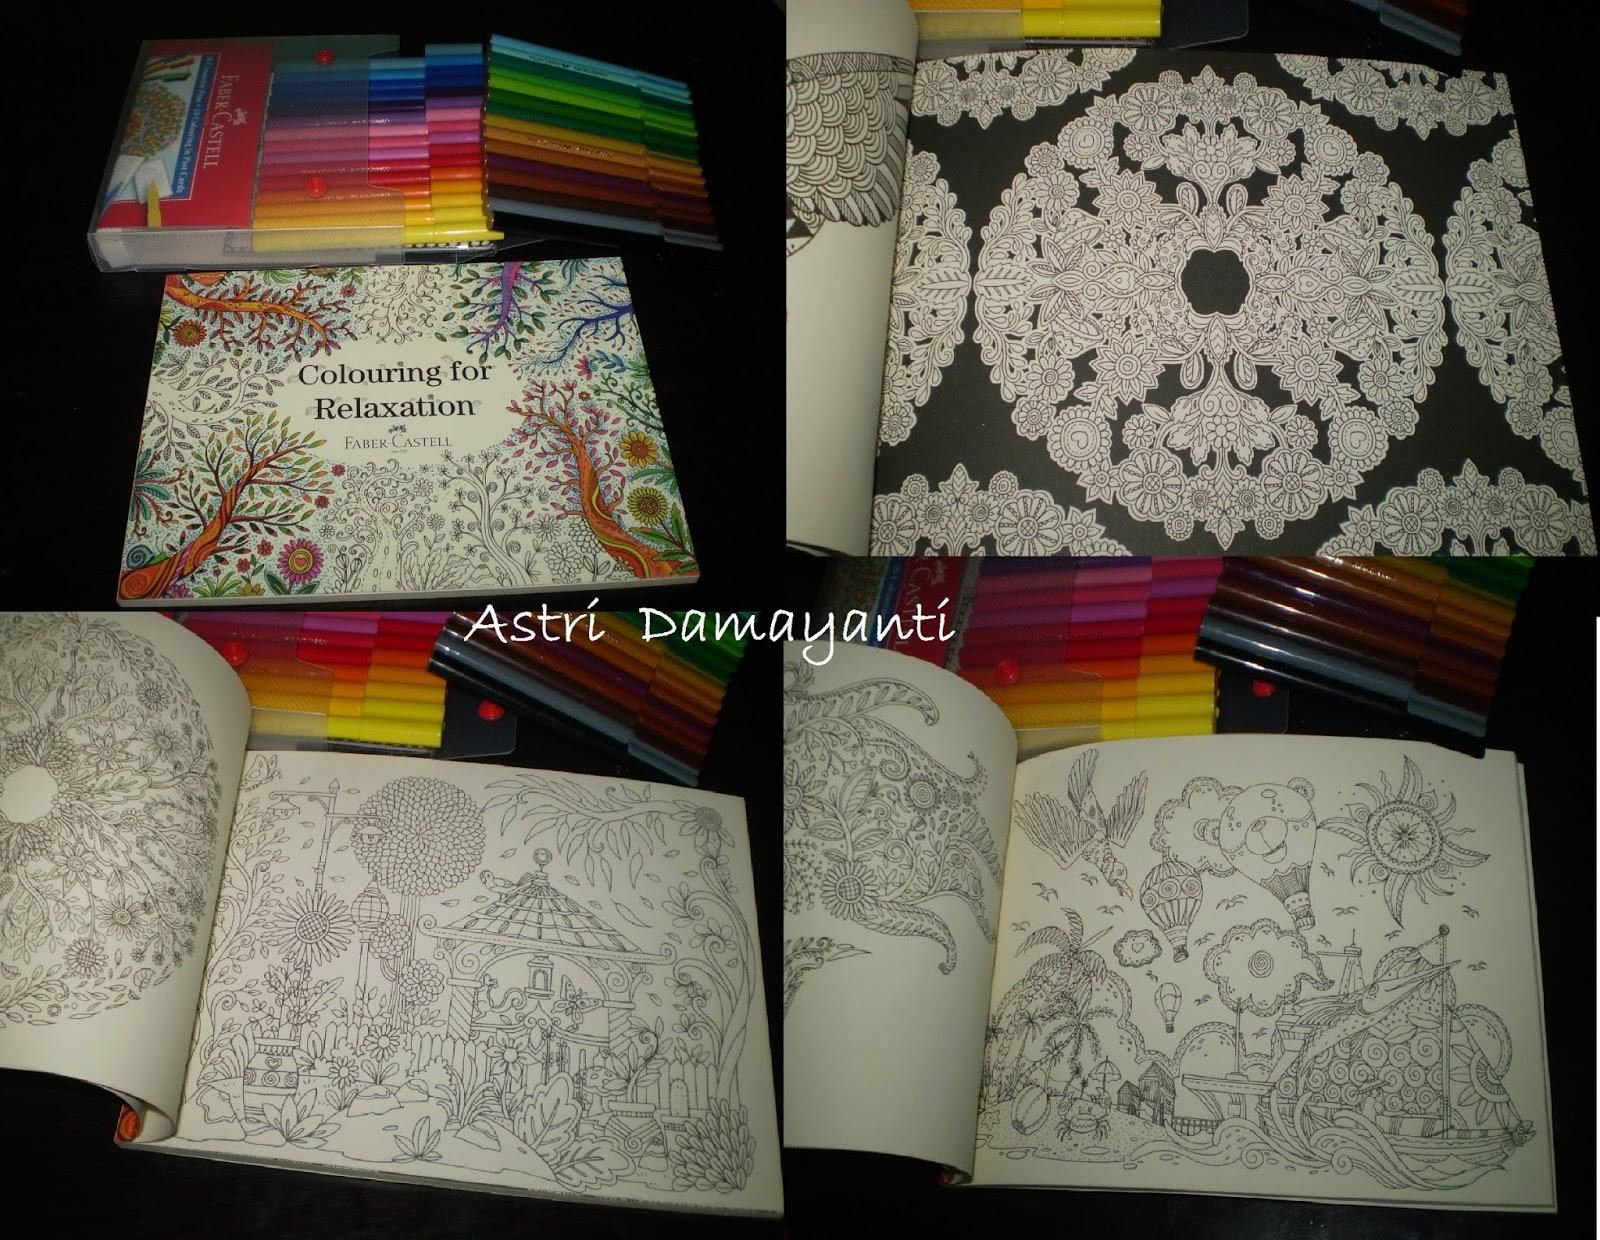 Orang Dewasa Mewarnai dengan Buku Colouring for Relaxation